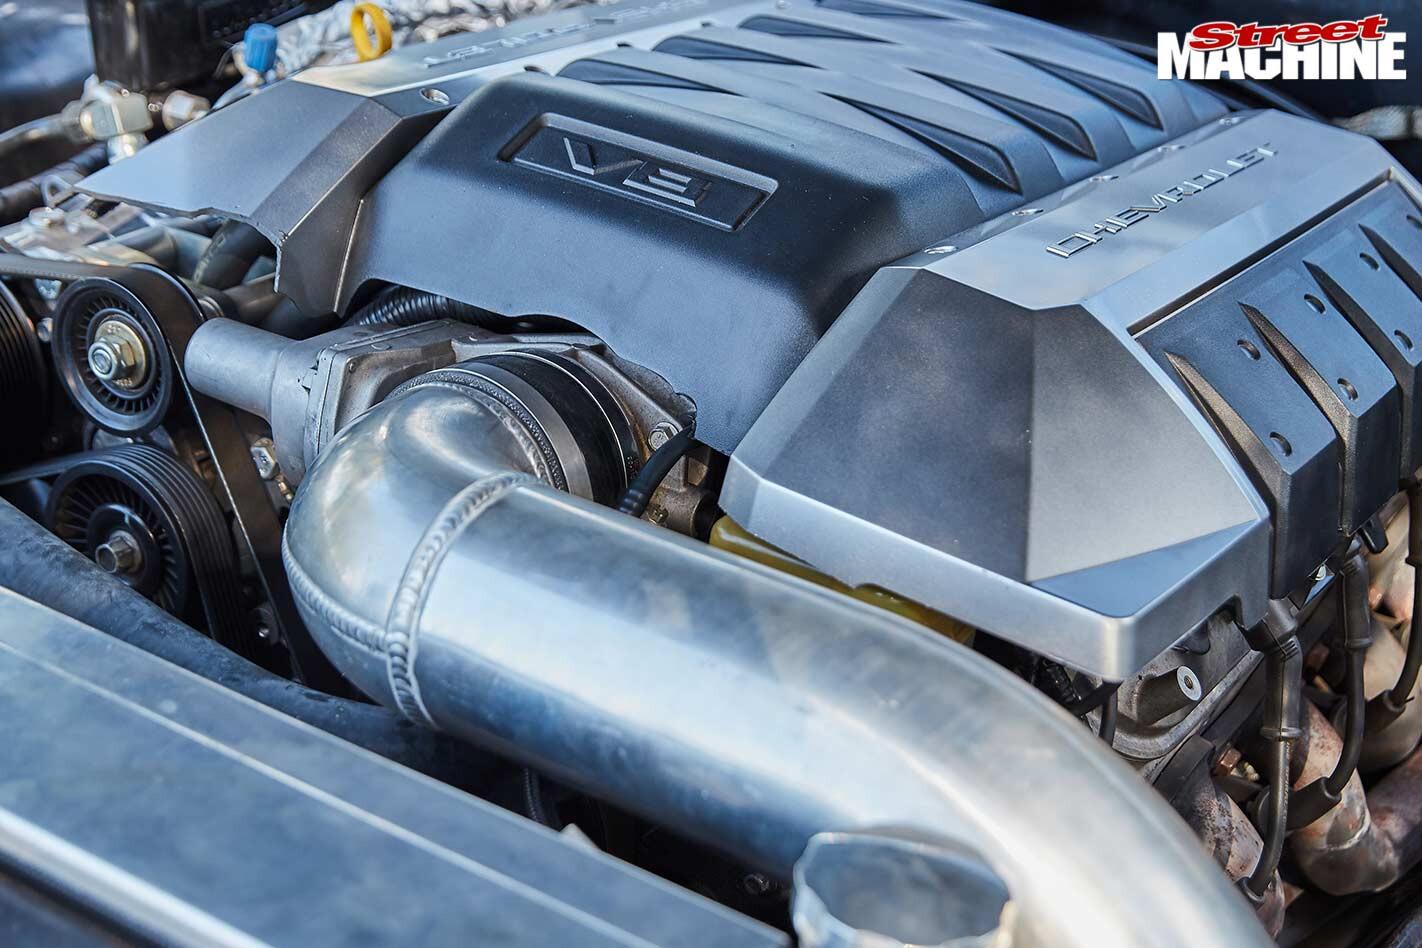 Chev Bel Air engine bay